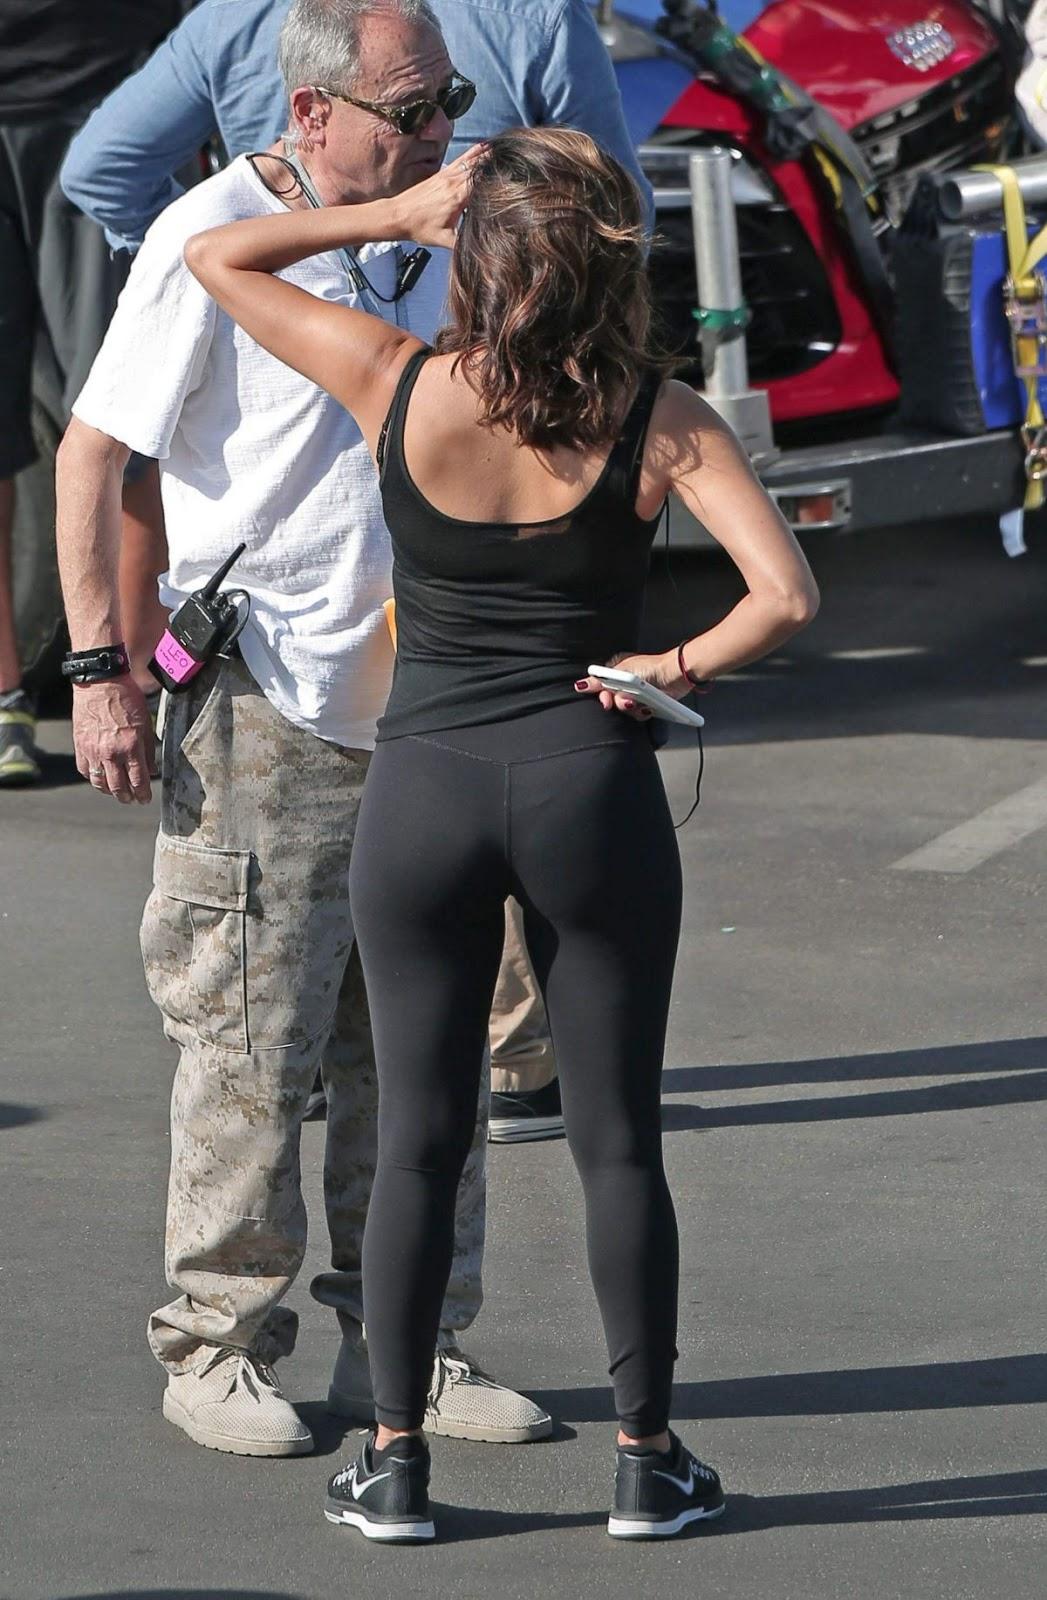 Eva Longoria Booty in Leggings